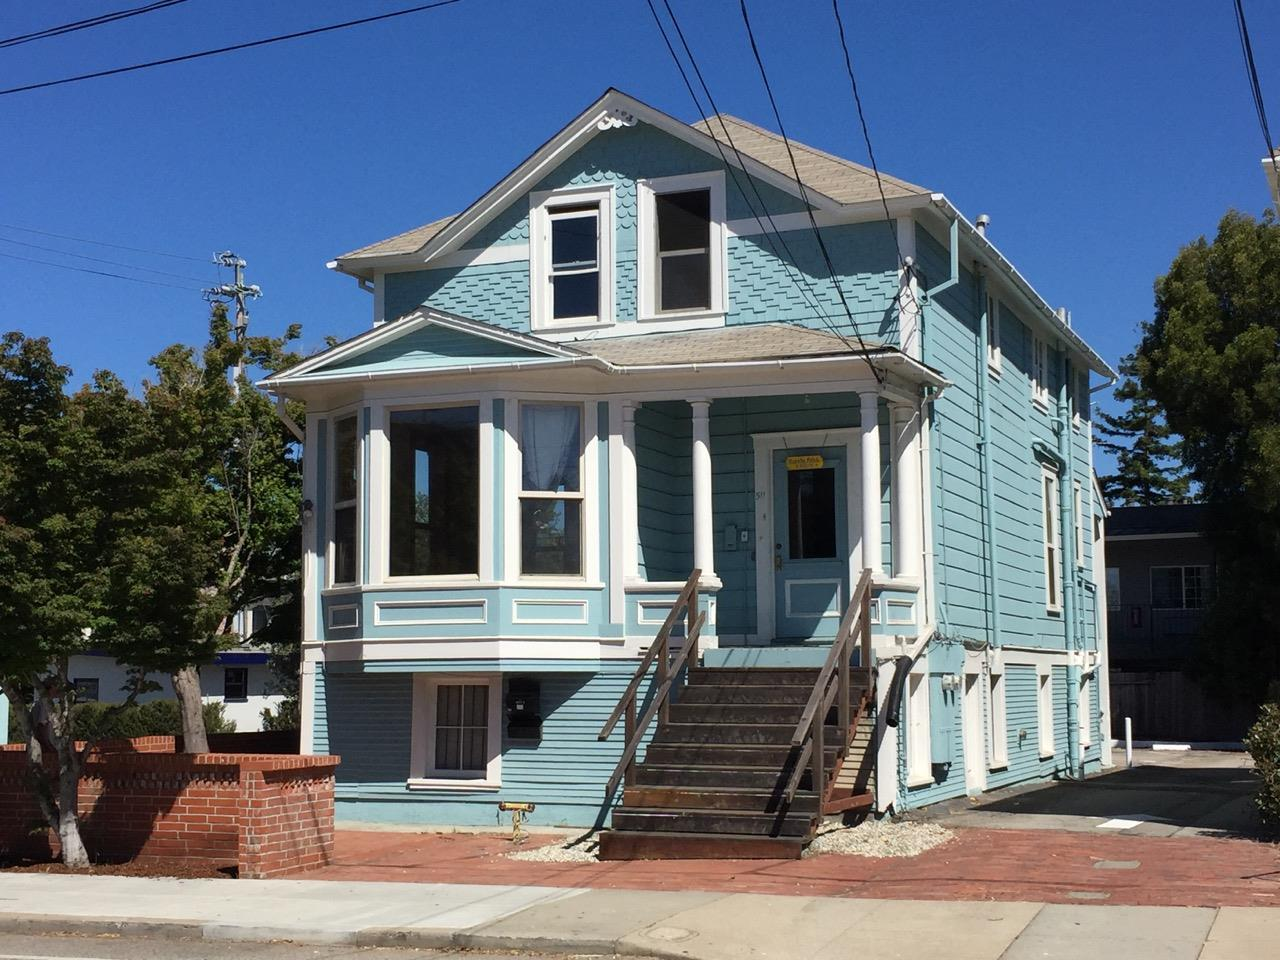 511 Broadway St, Santa Cruz, Ca 95060 | Mission Property Management